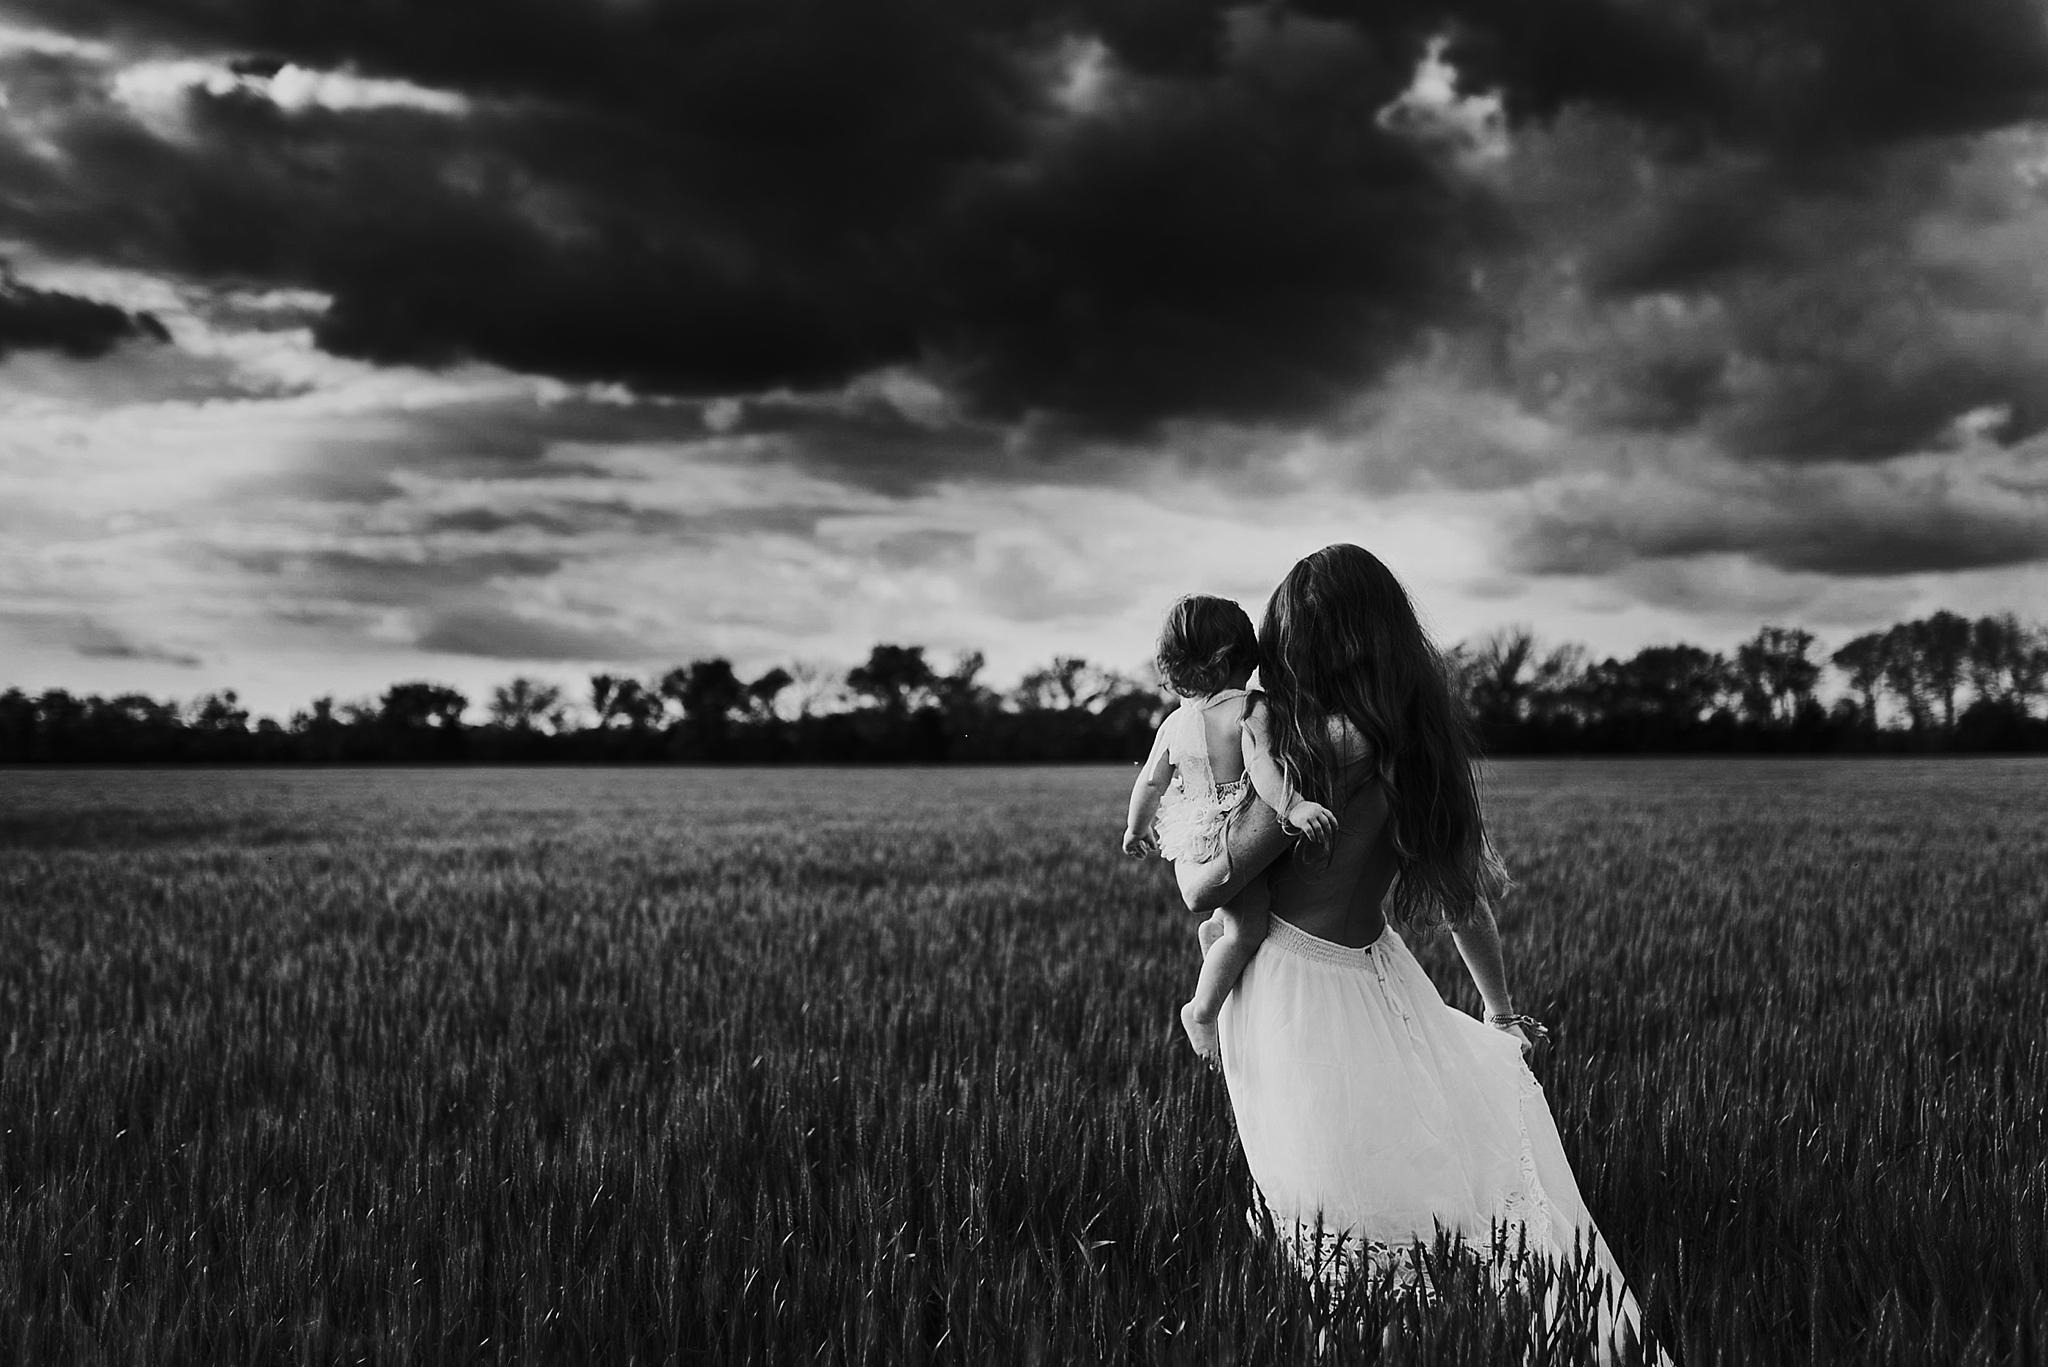 twyla jones photography - mother daughter - field and forest-4324_treasure coast florida.jpg